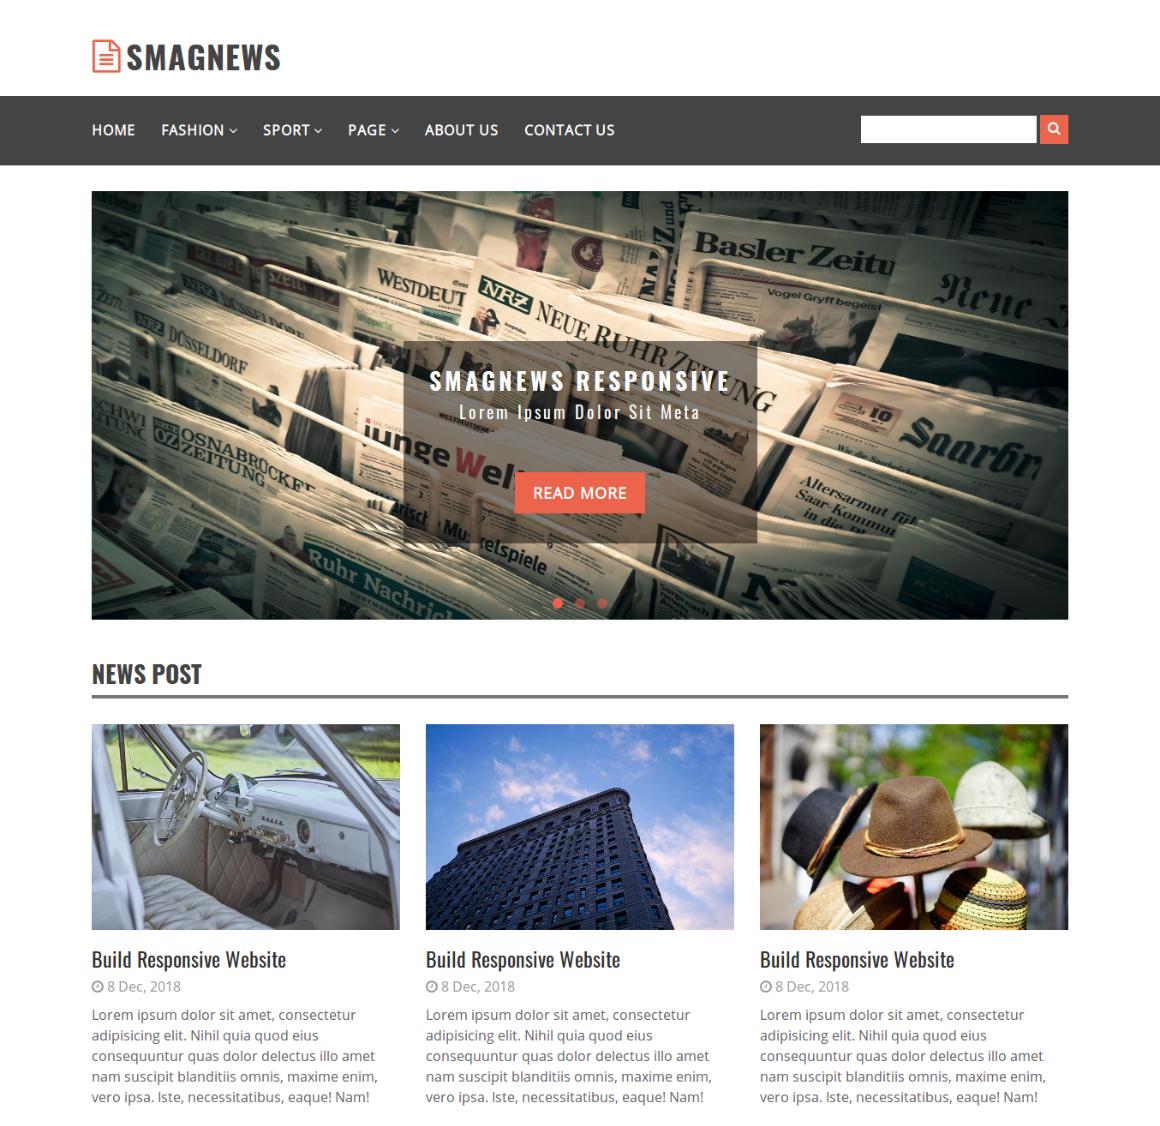 35 Premium HTML Landing Templates - $12 - smagnews